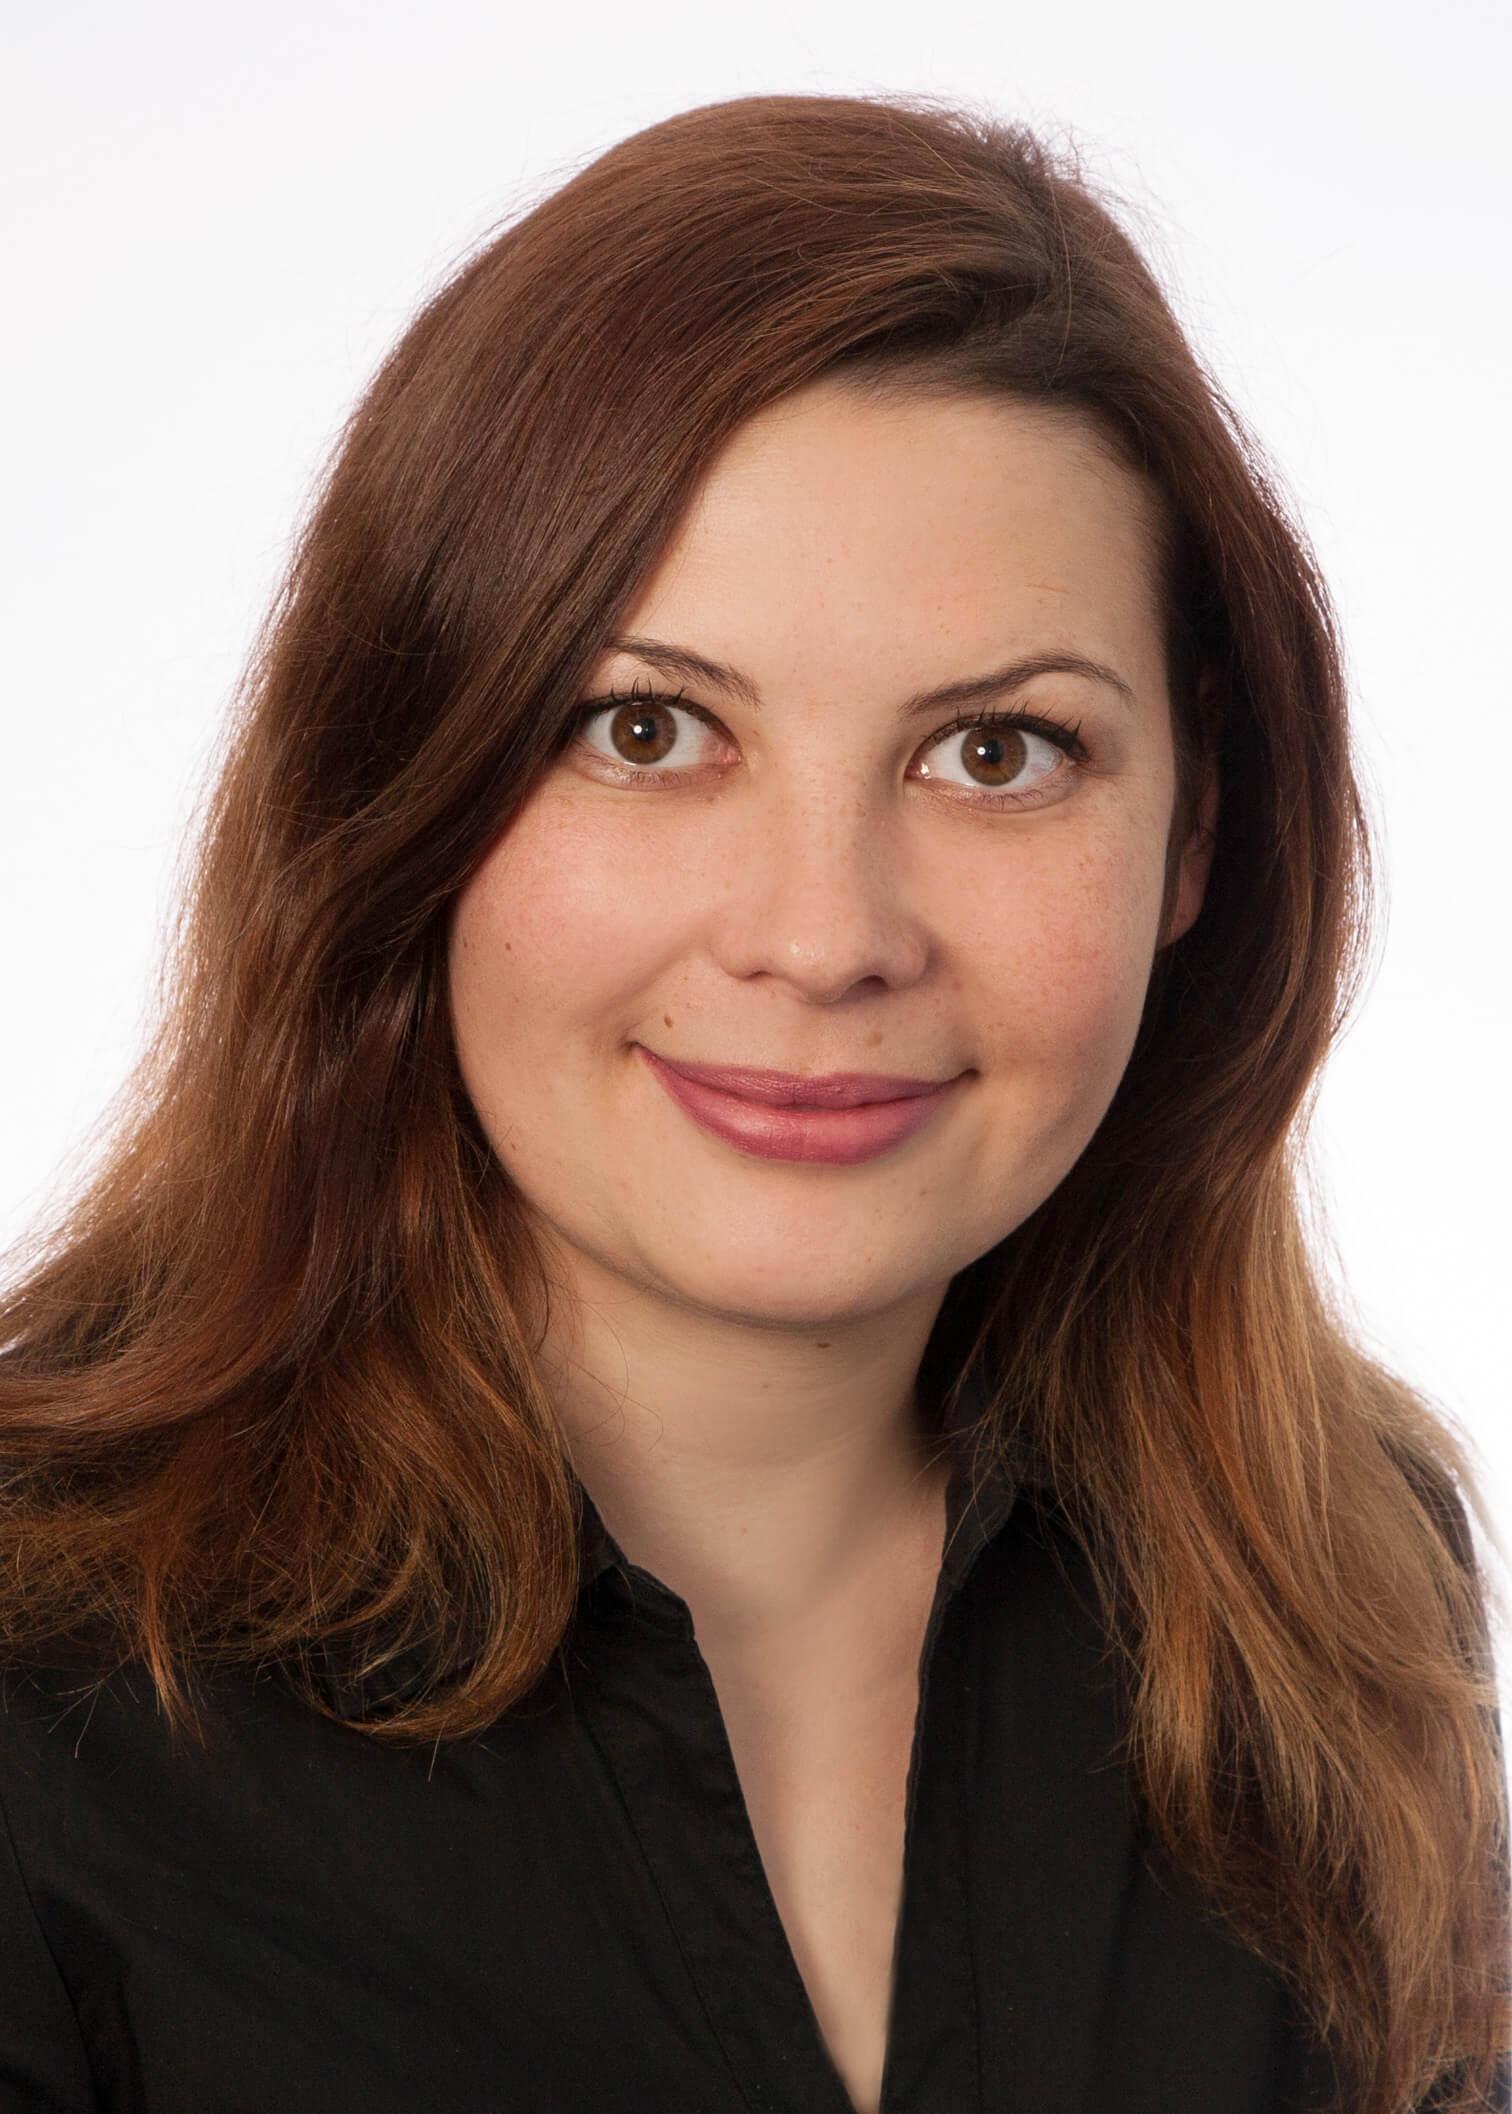 Sarah Sandig